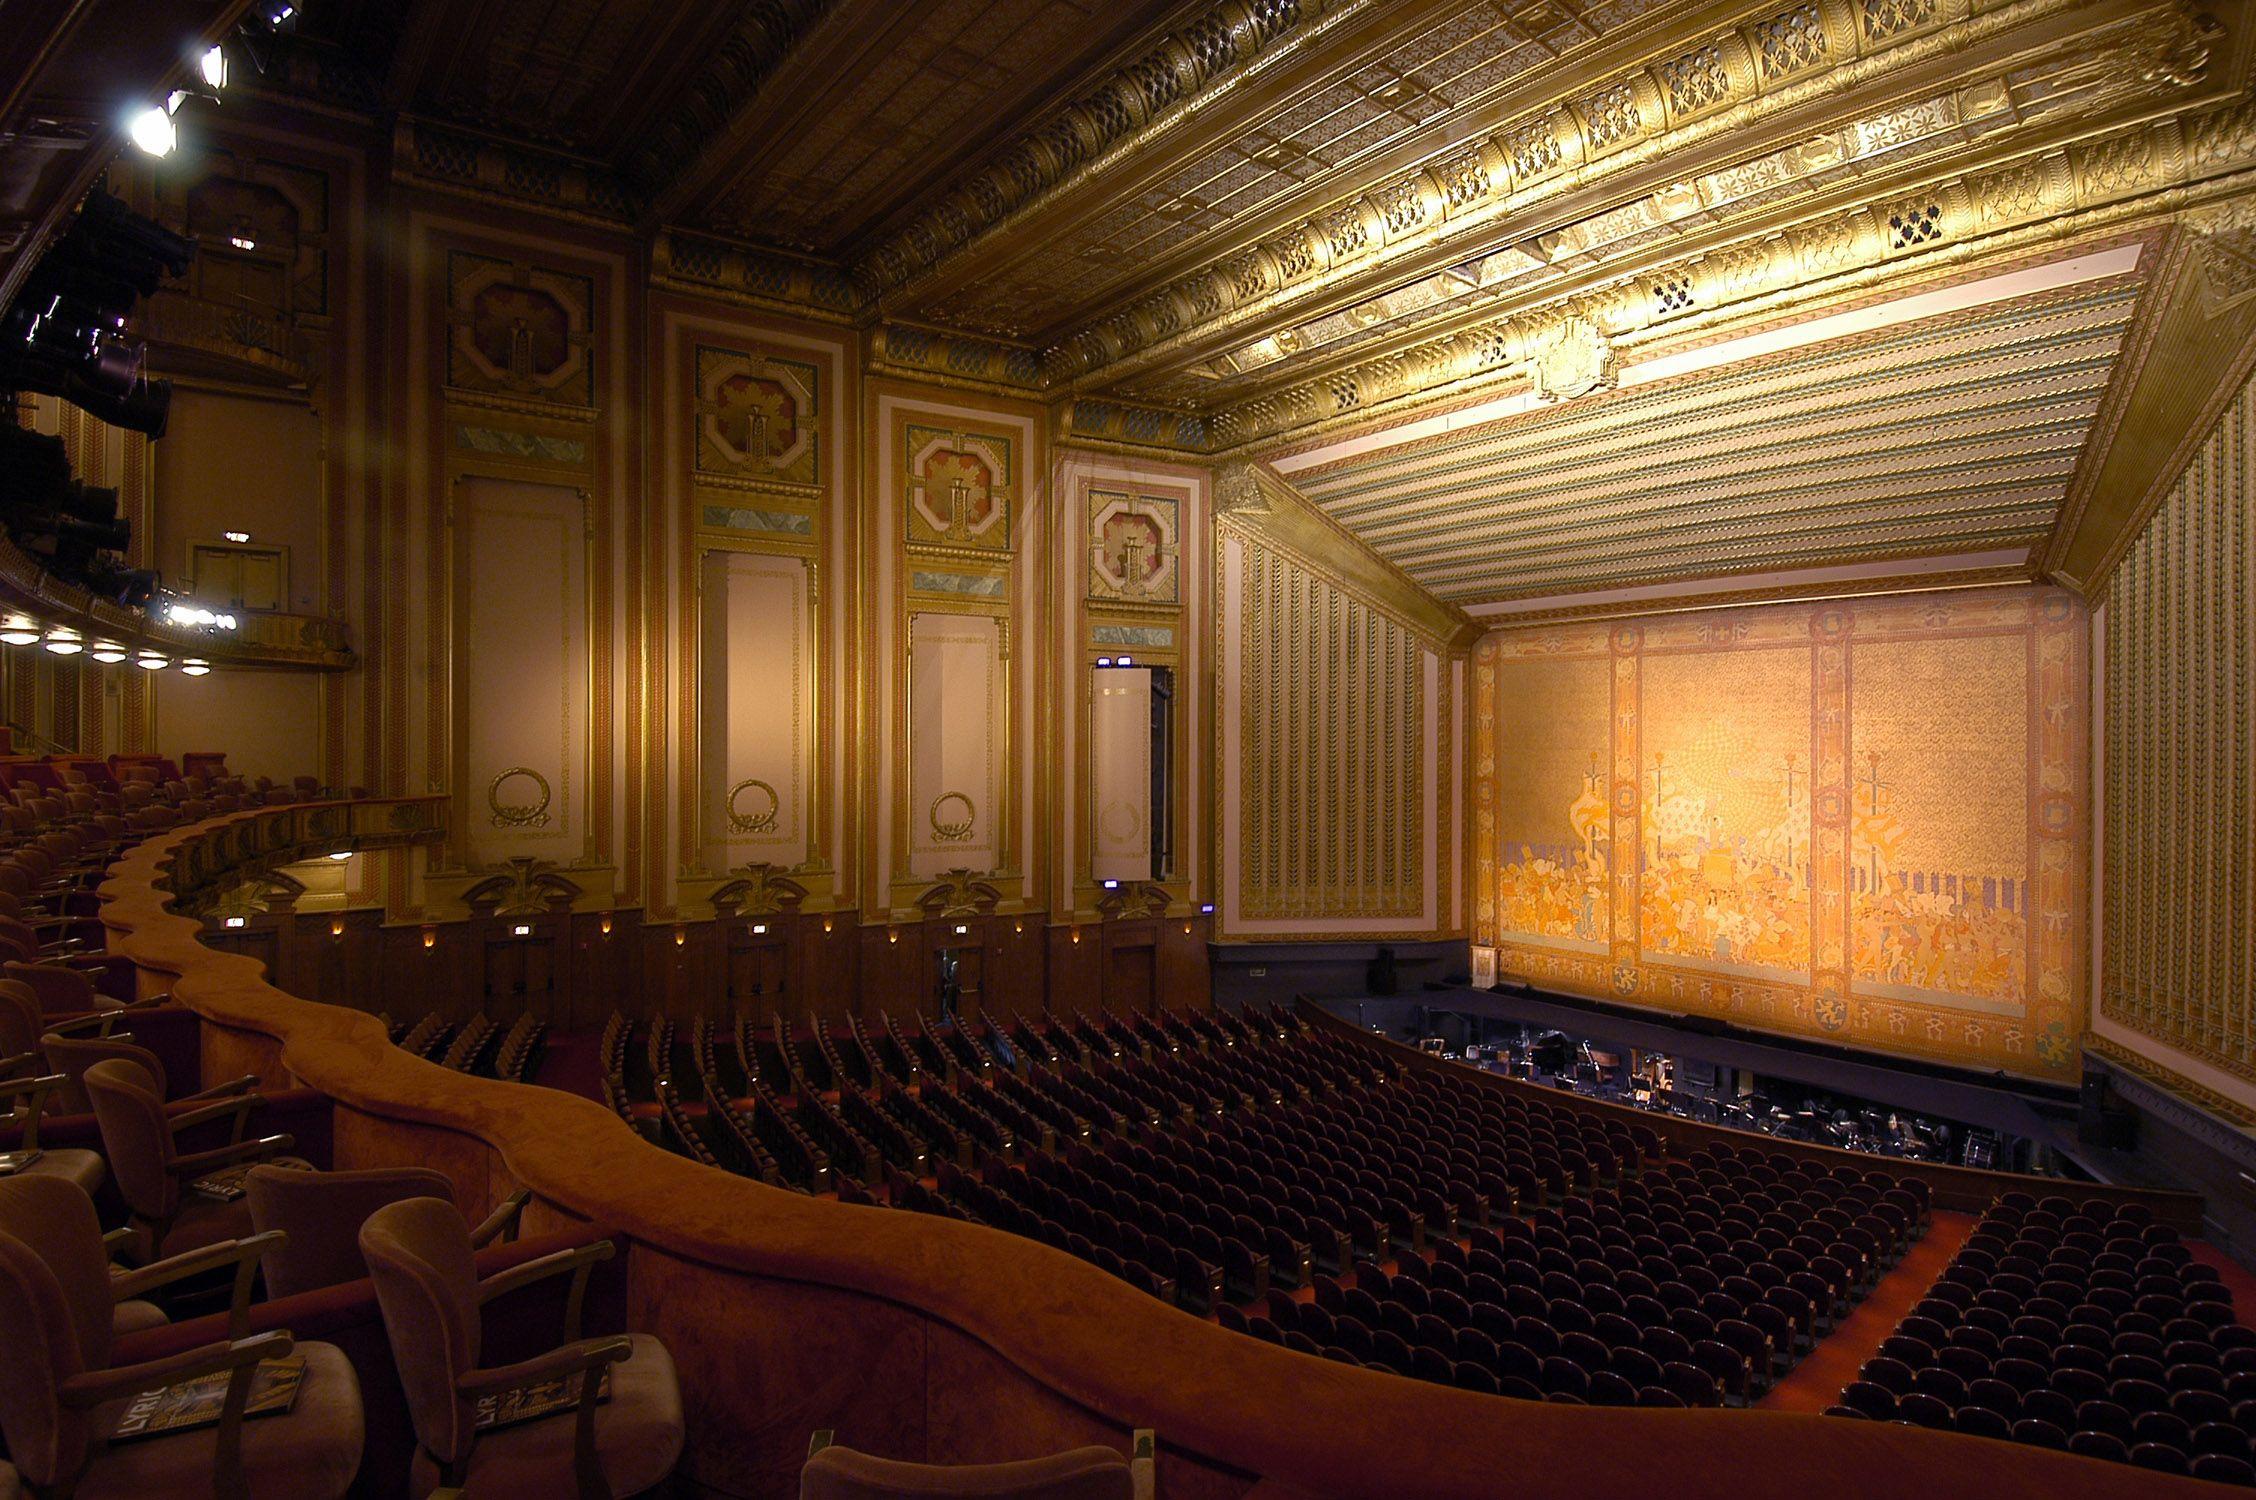 Lyric Opera of Chicago Civic Opera House OHC2013 See inside the dramatic Grand Foyer